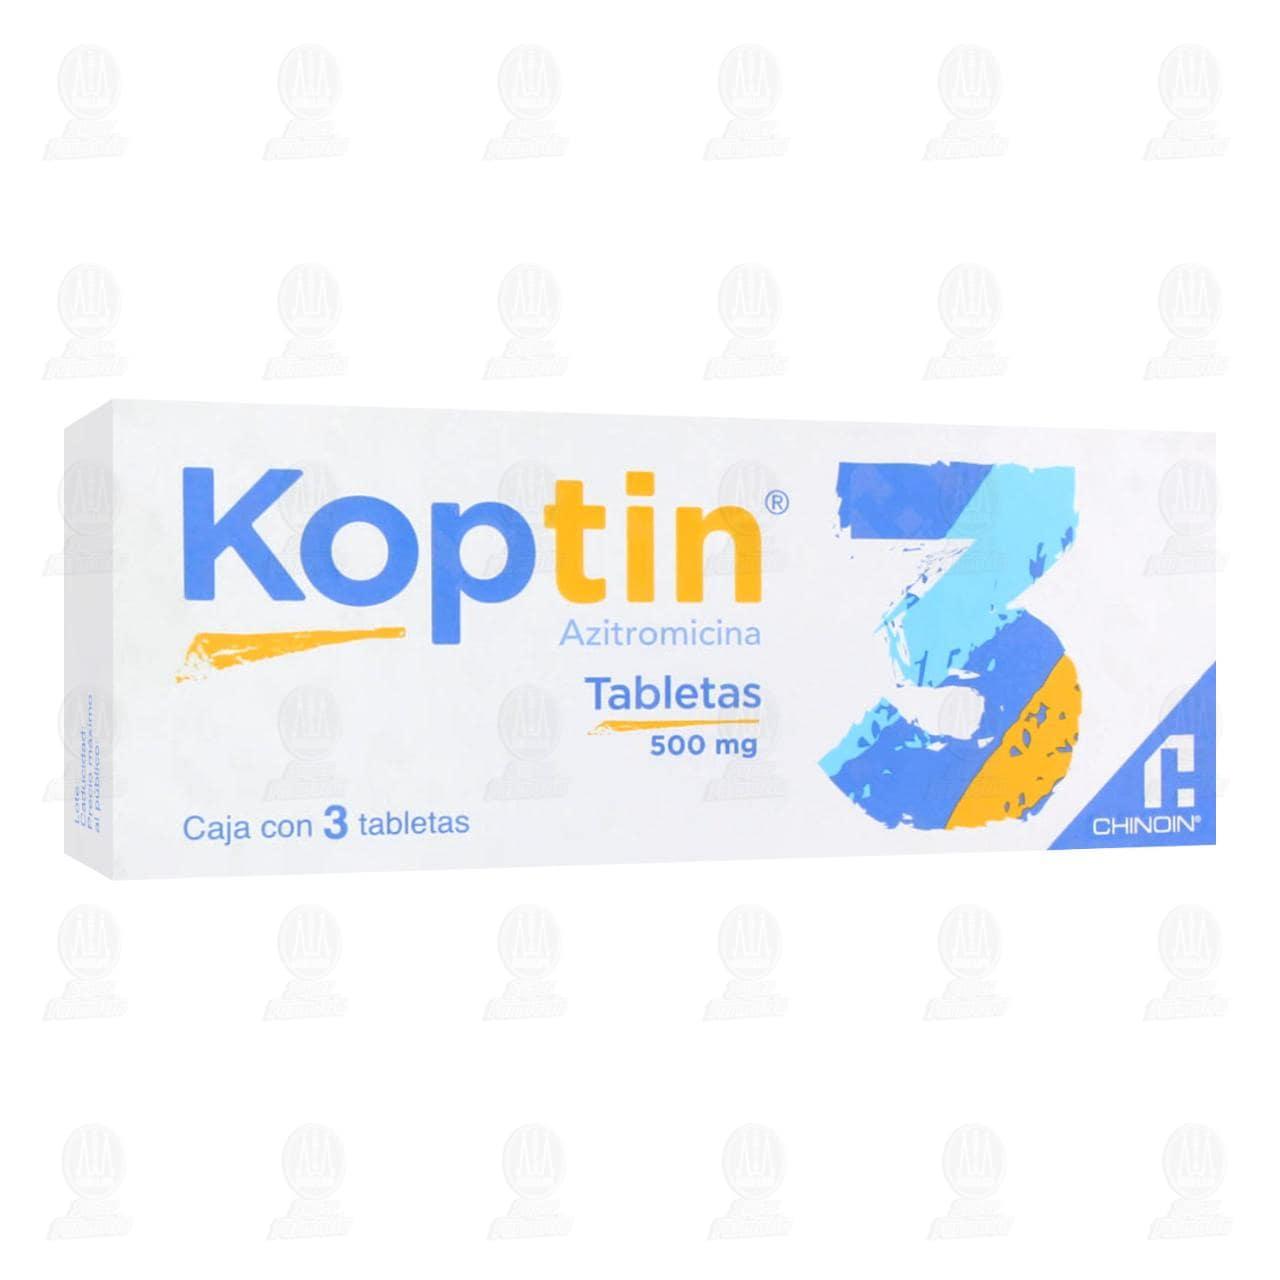 Comprar Koptin 500mg 3 Tabletas en Farmacias Guadalajara